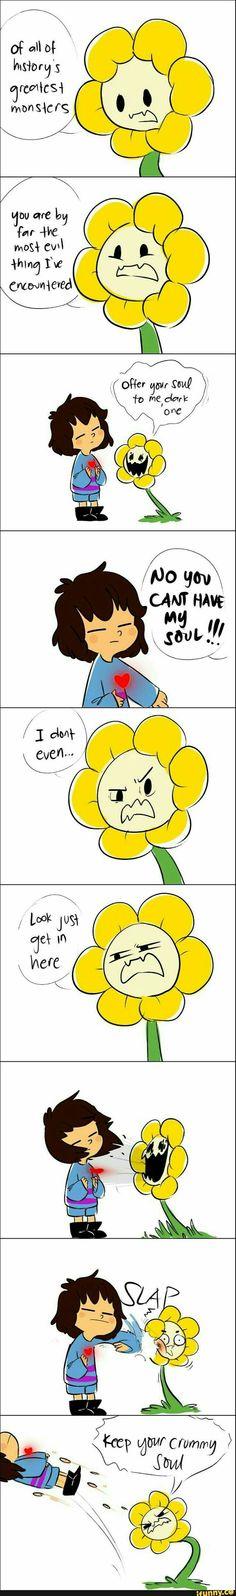 Undertale comic